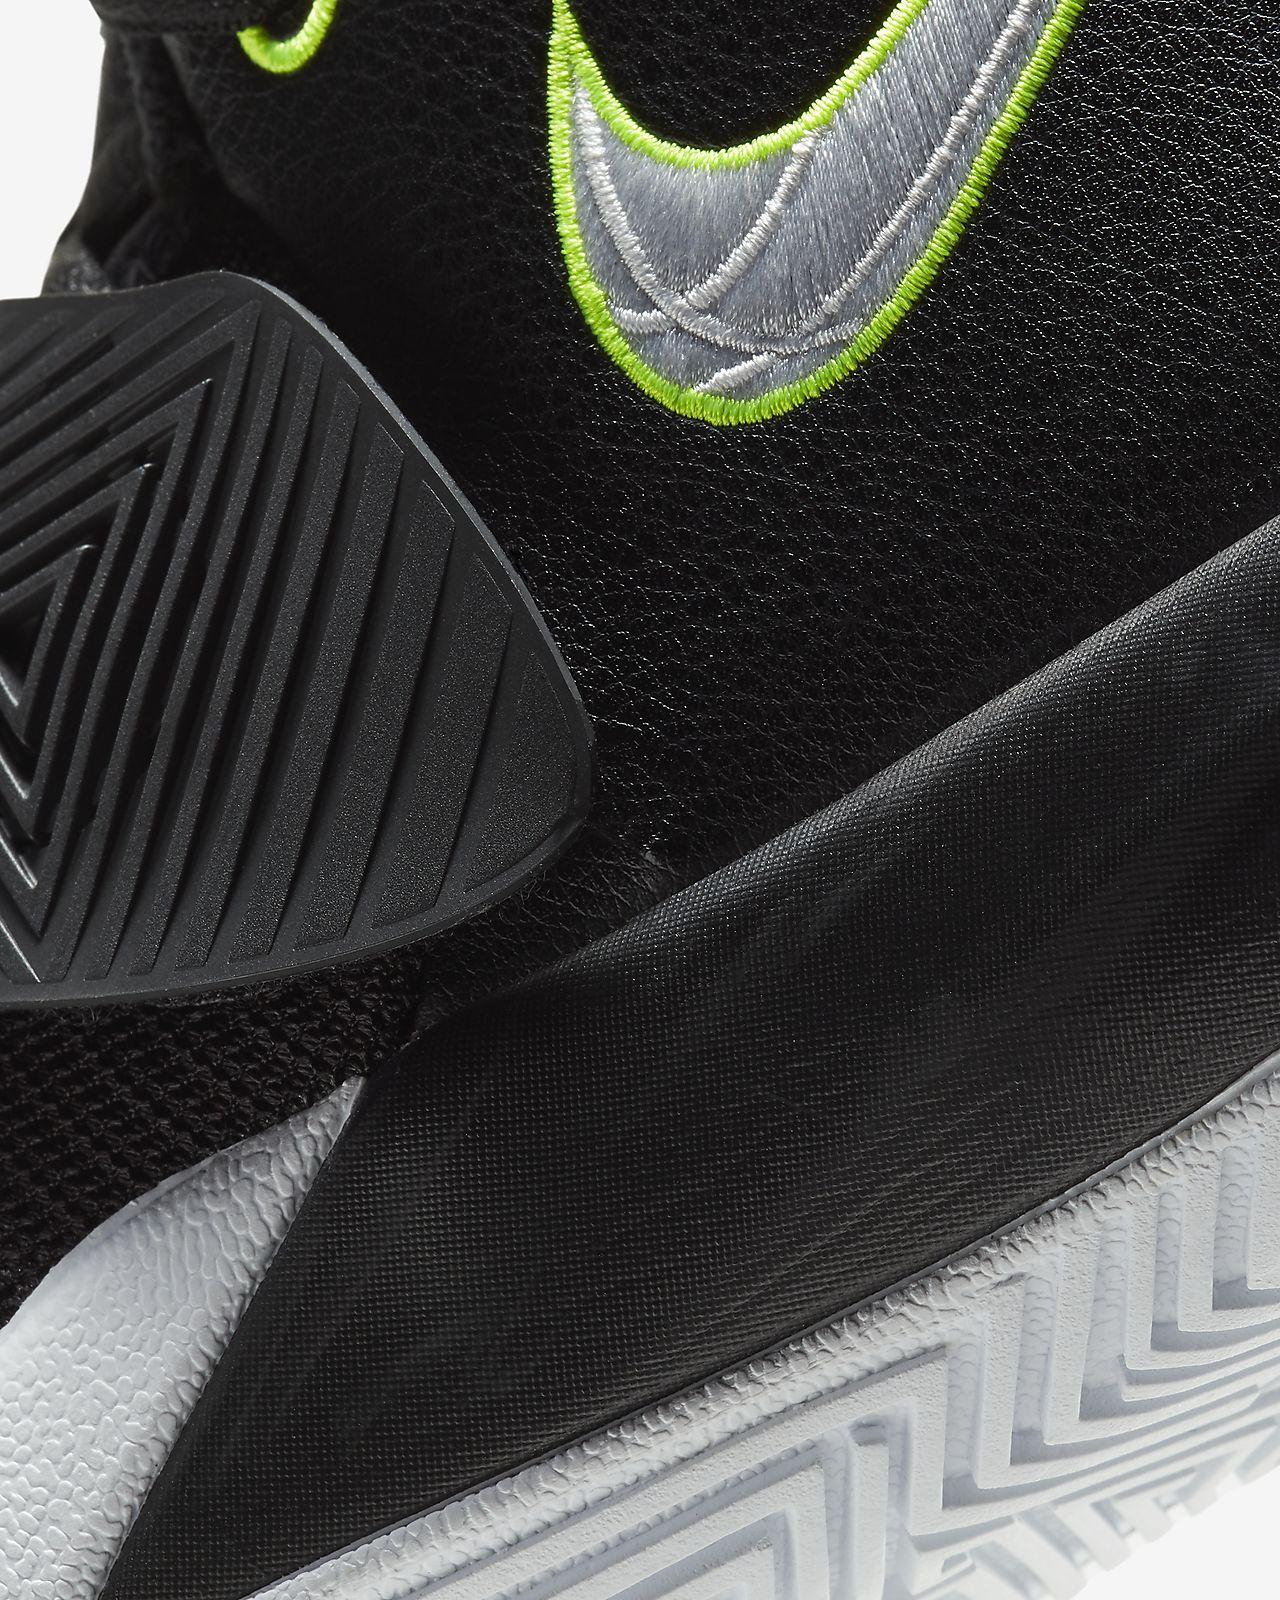 Nike Kyrie Flytrap Mens Basketball Shoes   Nike Basketball